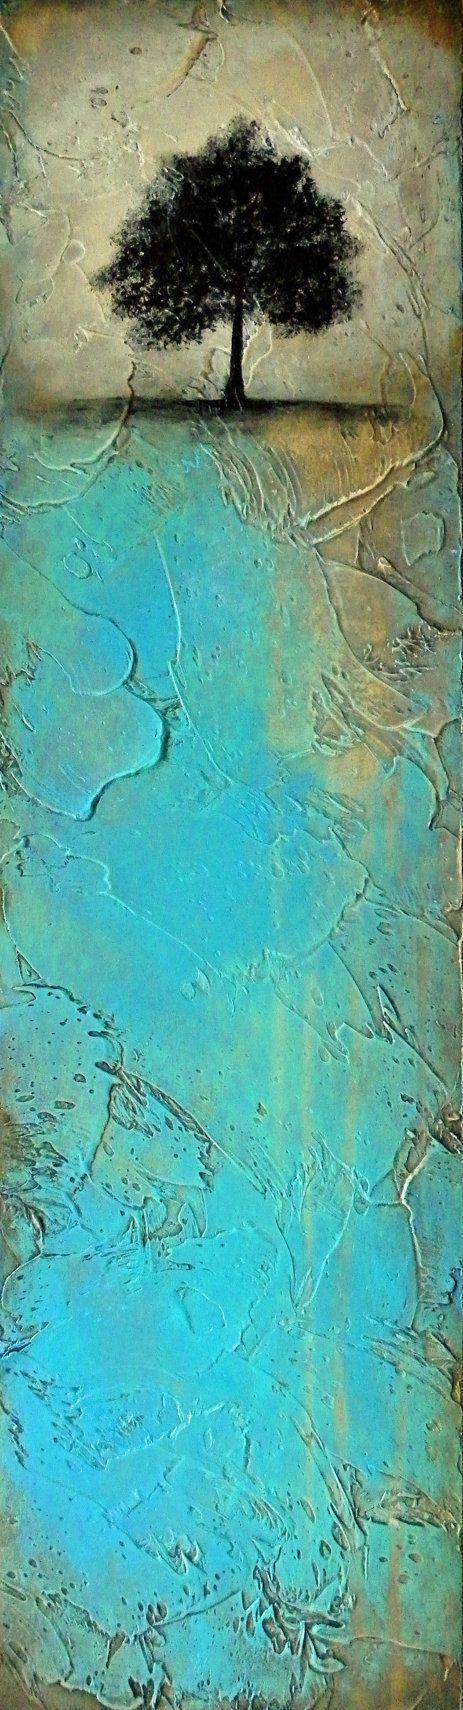 Beautiful Abstract Tree Painting Original Art Heavily Textured